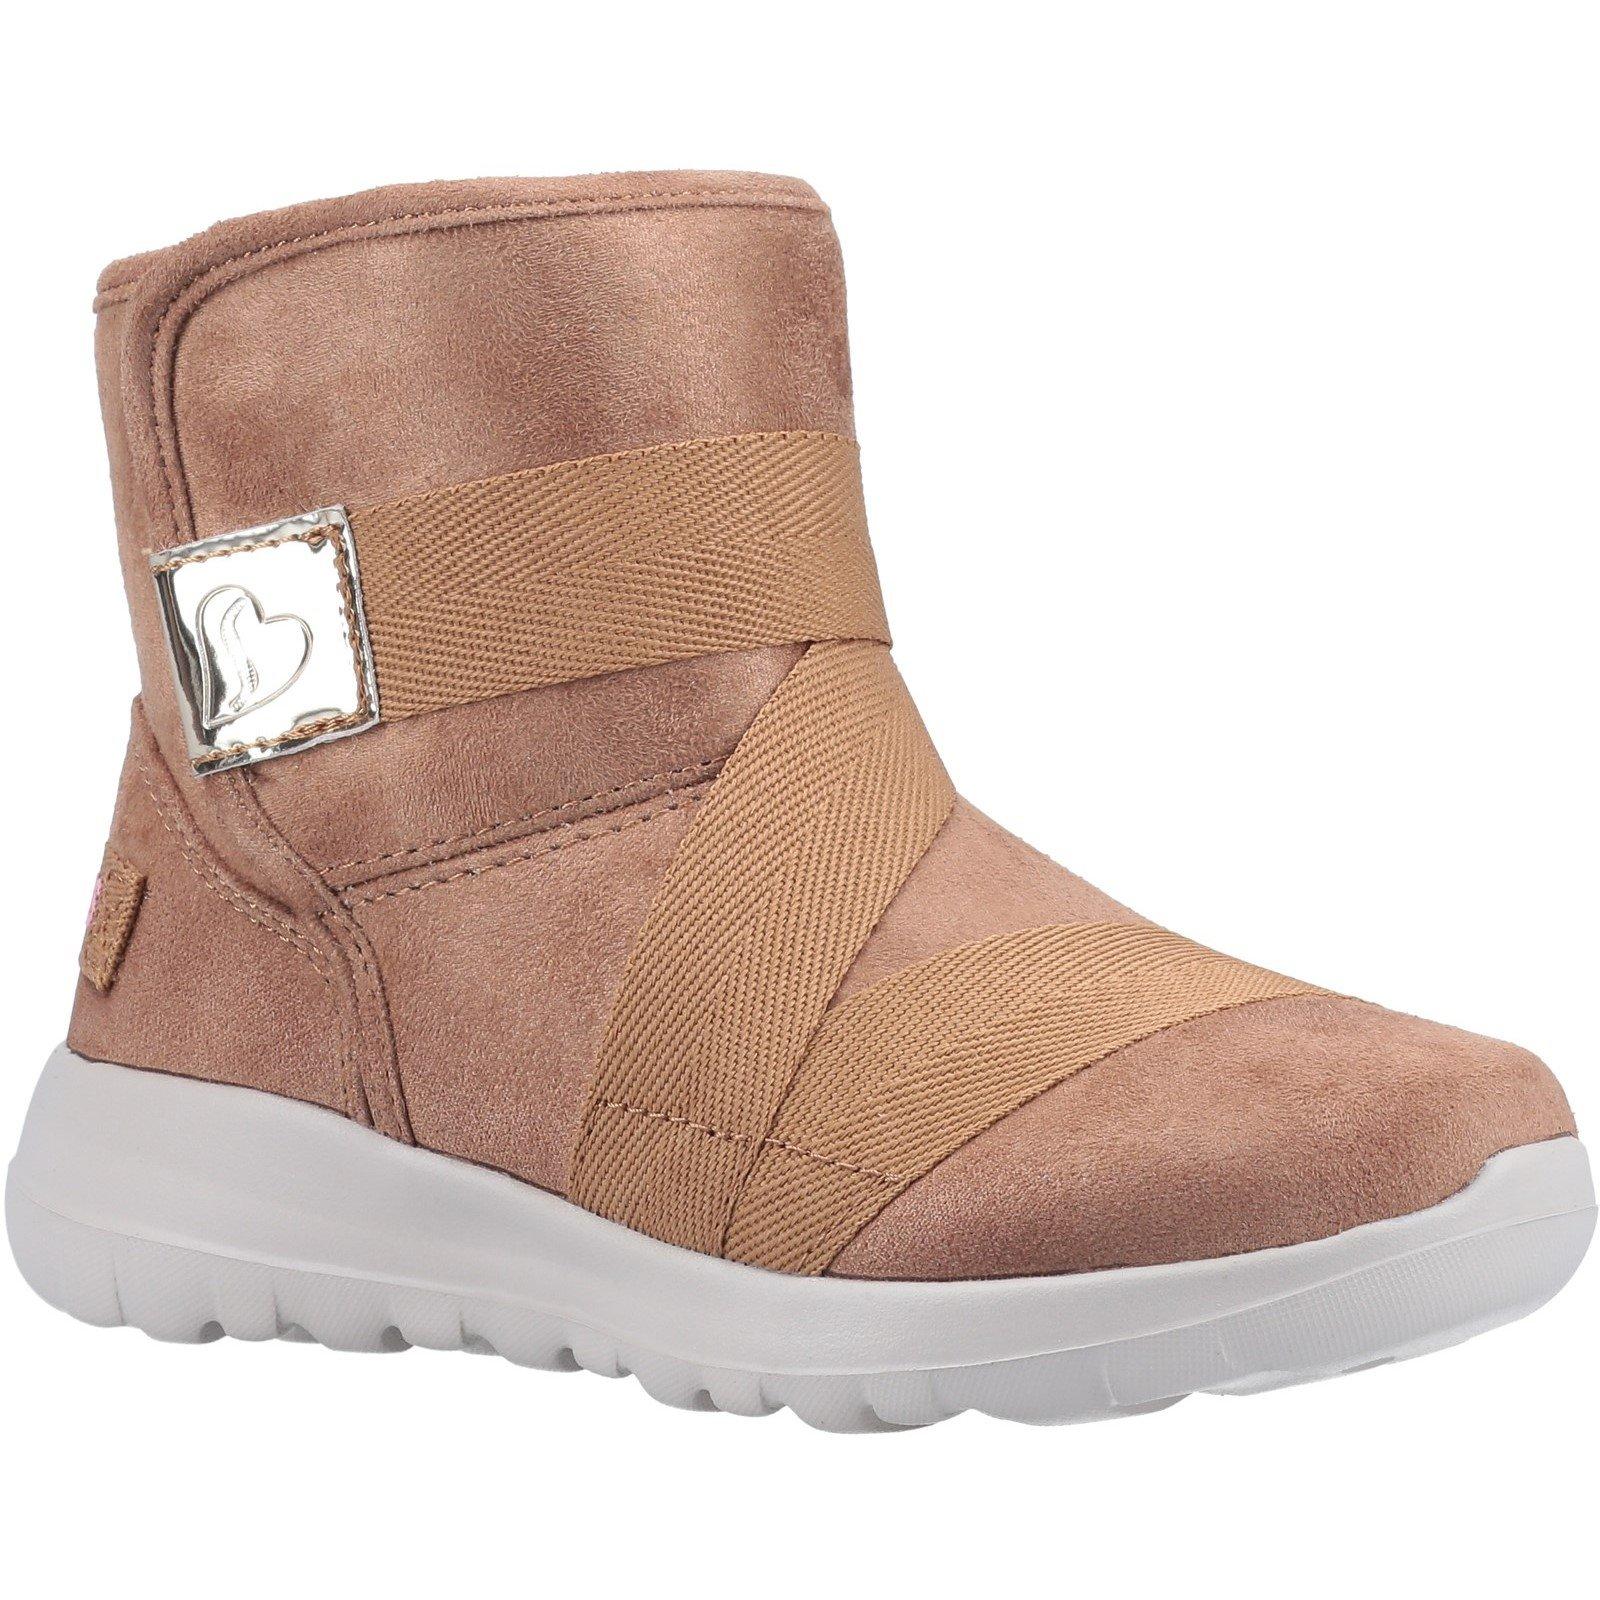 Skechers Unisex Go Walk Joy Strong Willed Ankle Boot Chestnut 31167 - Chestnut 11.5